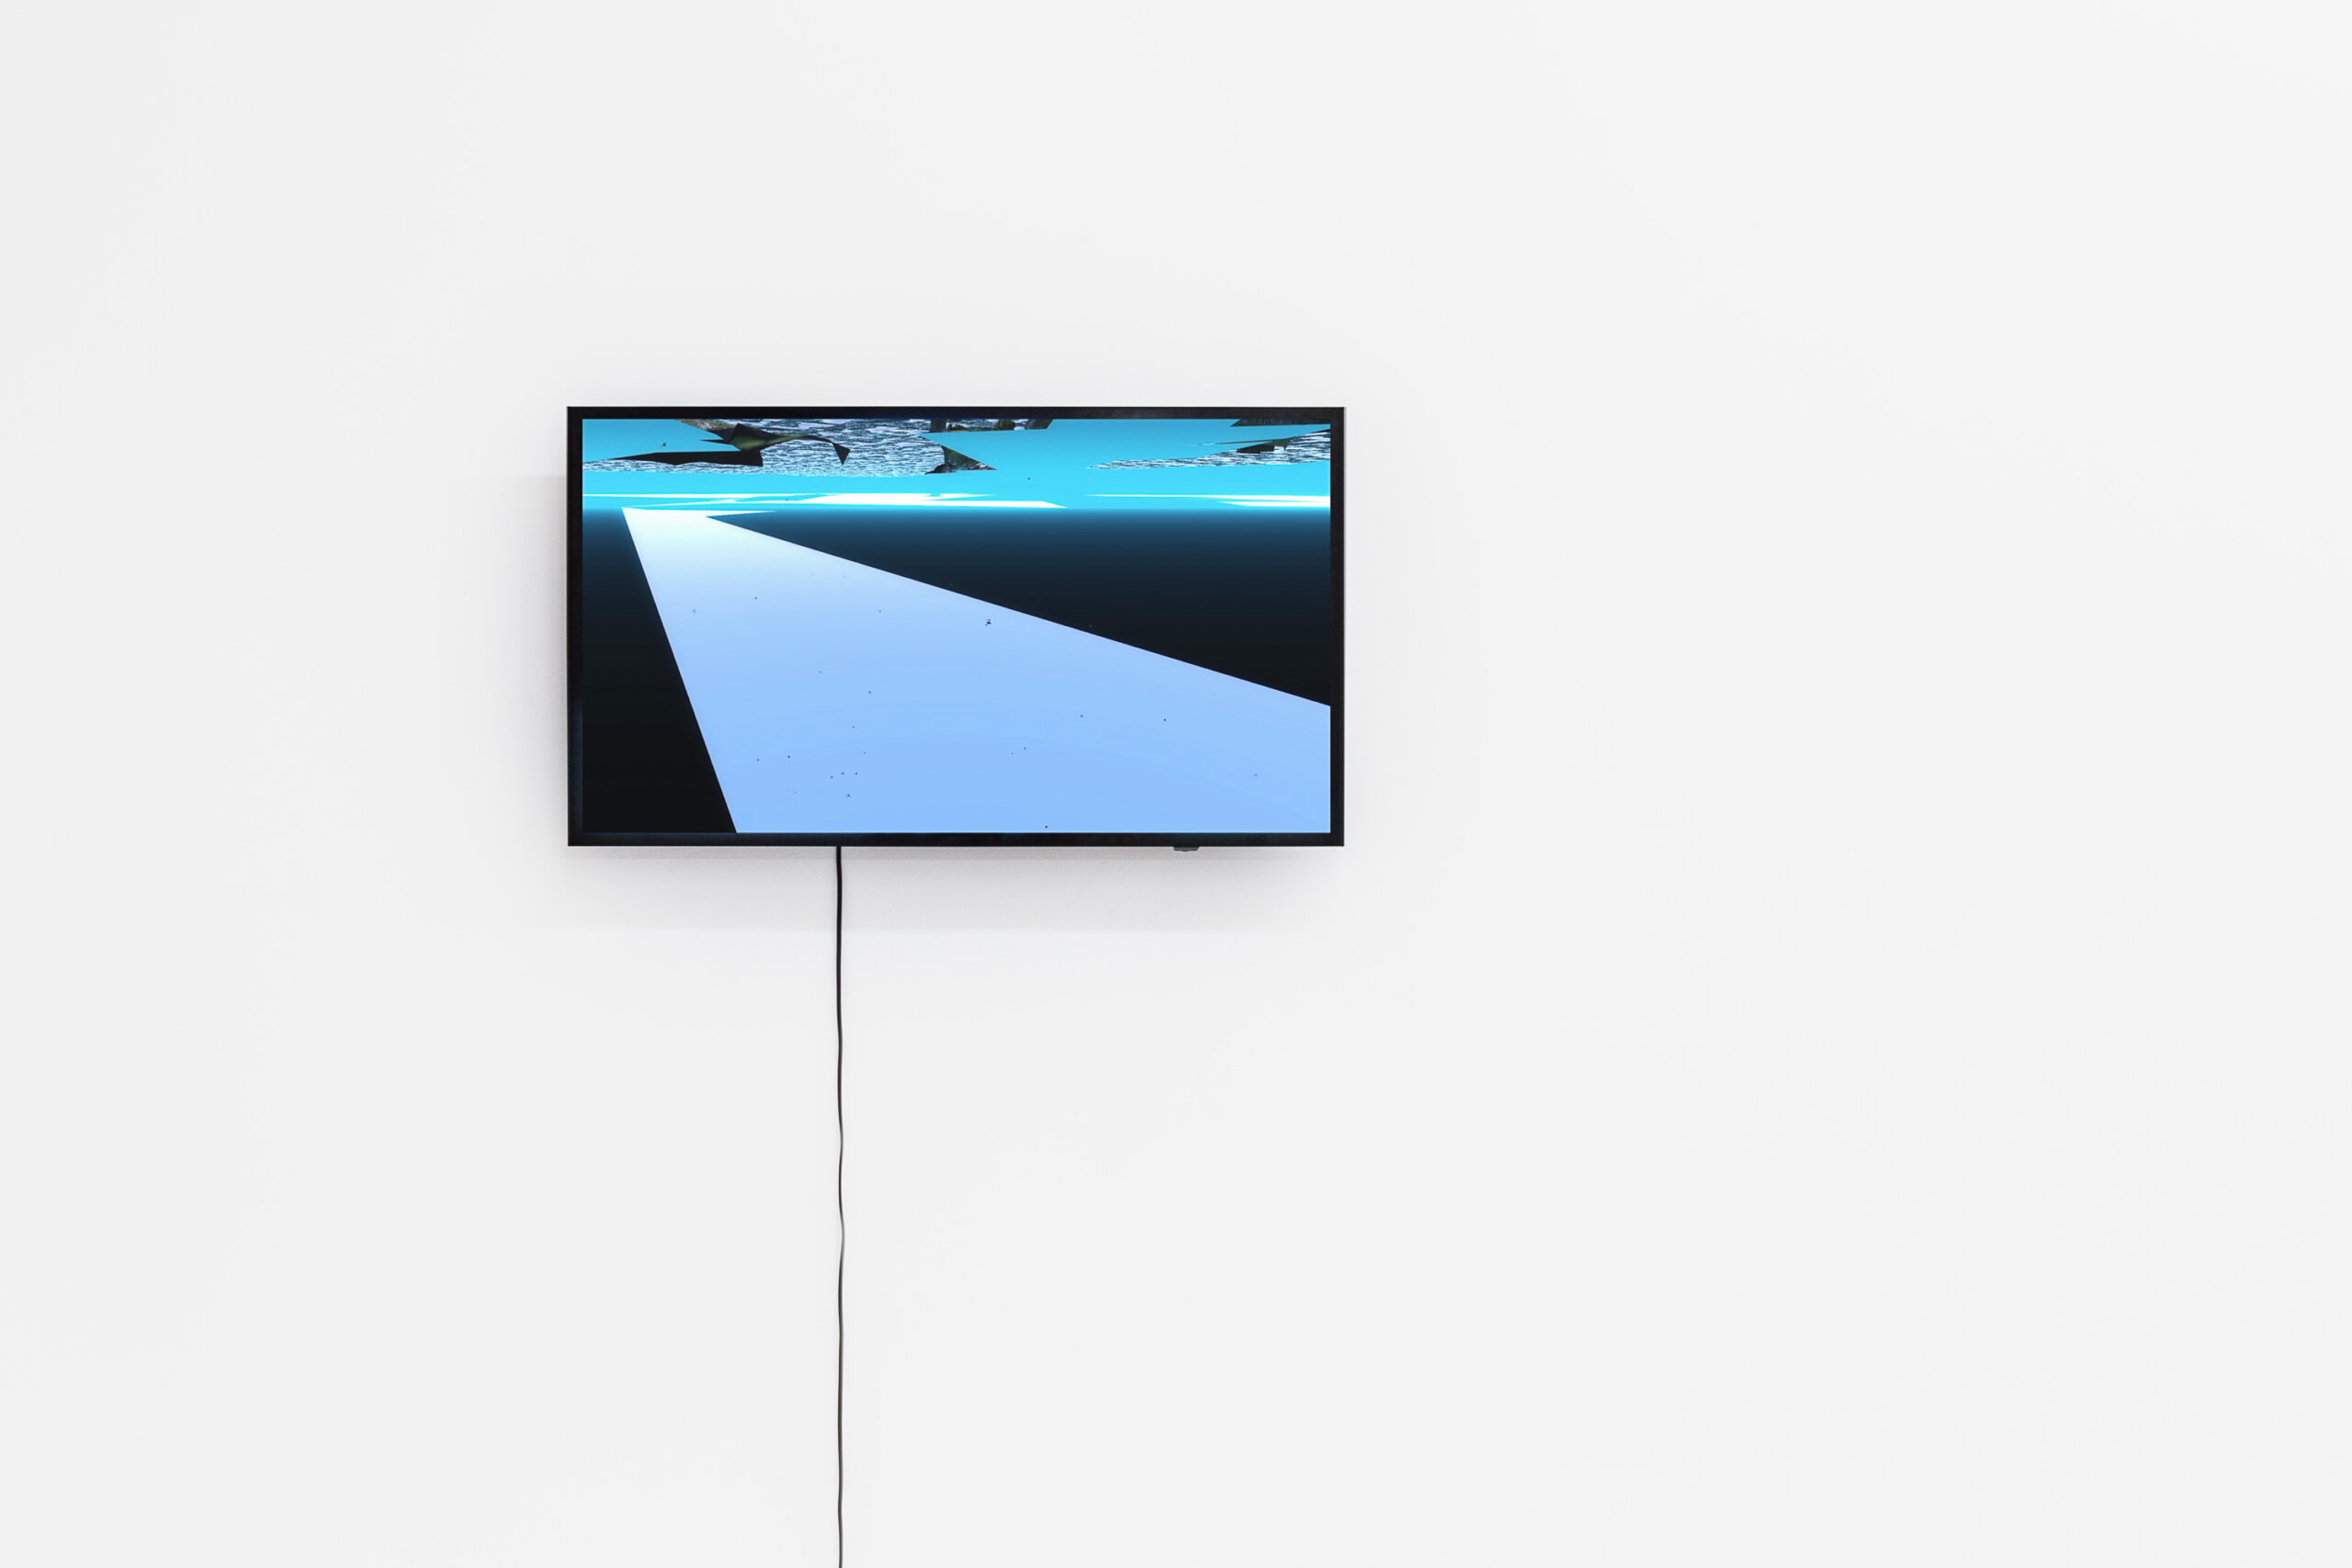 Jacek Doroszenko - Sound - Video - Warsaw - Exhibition 01